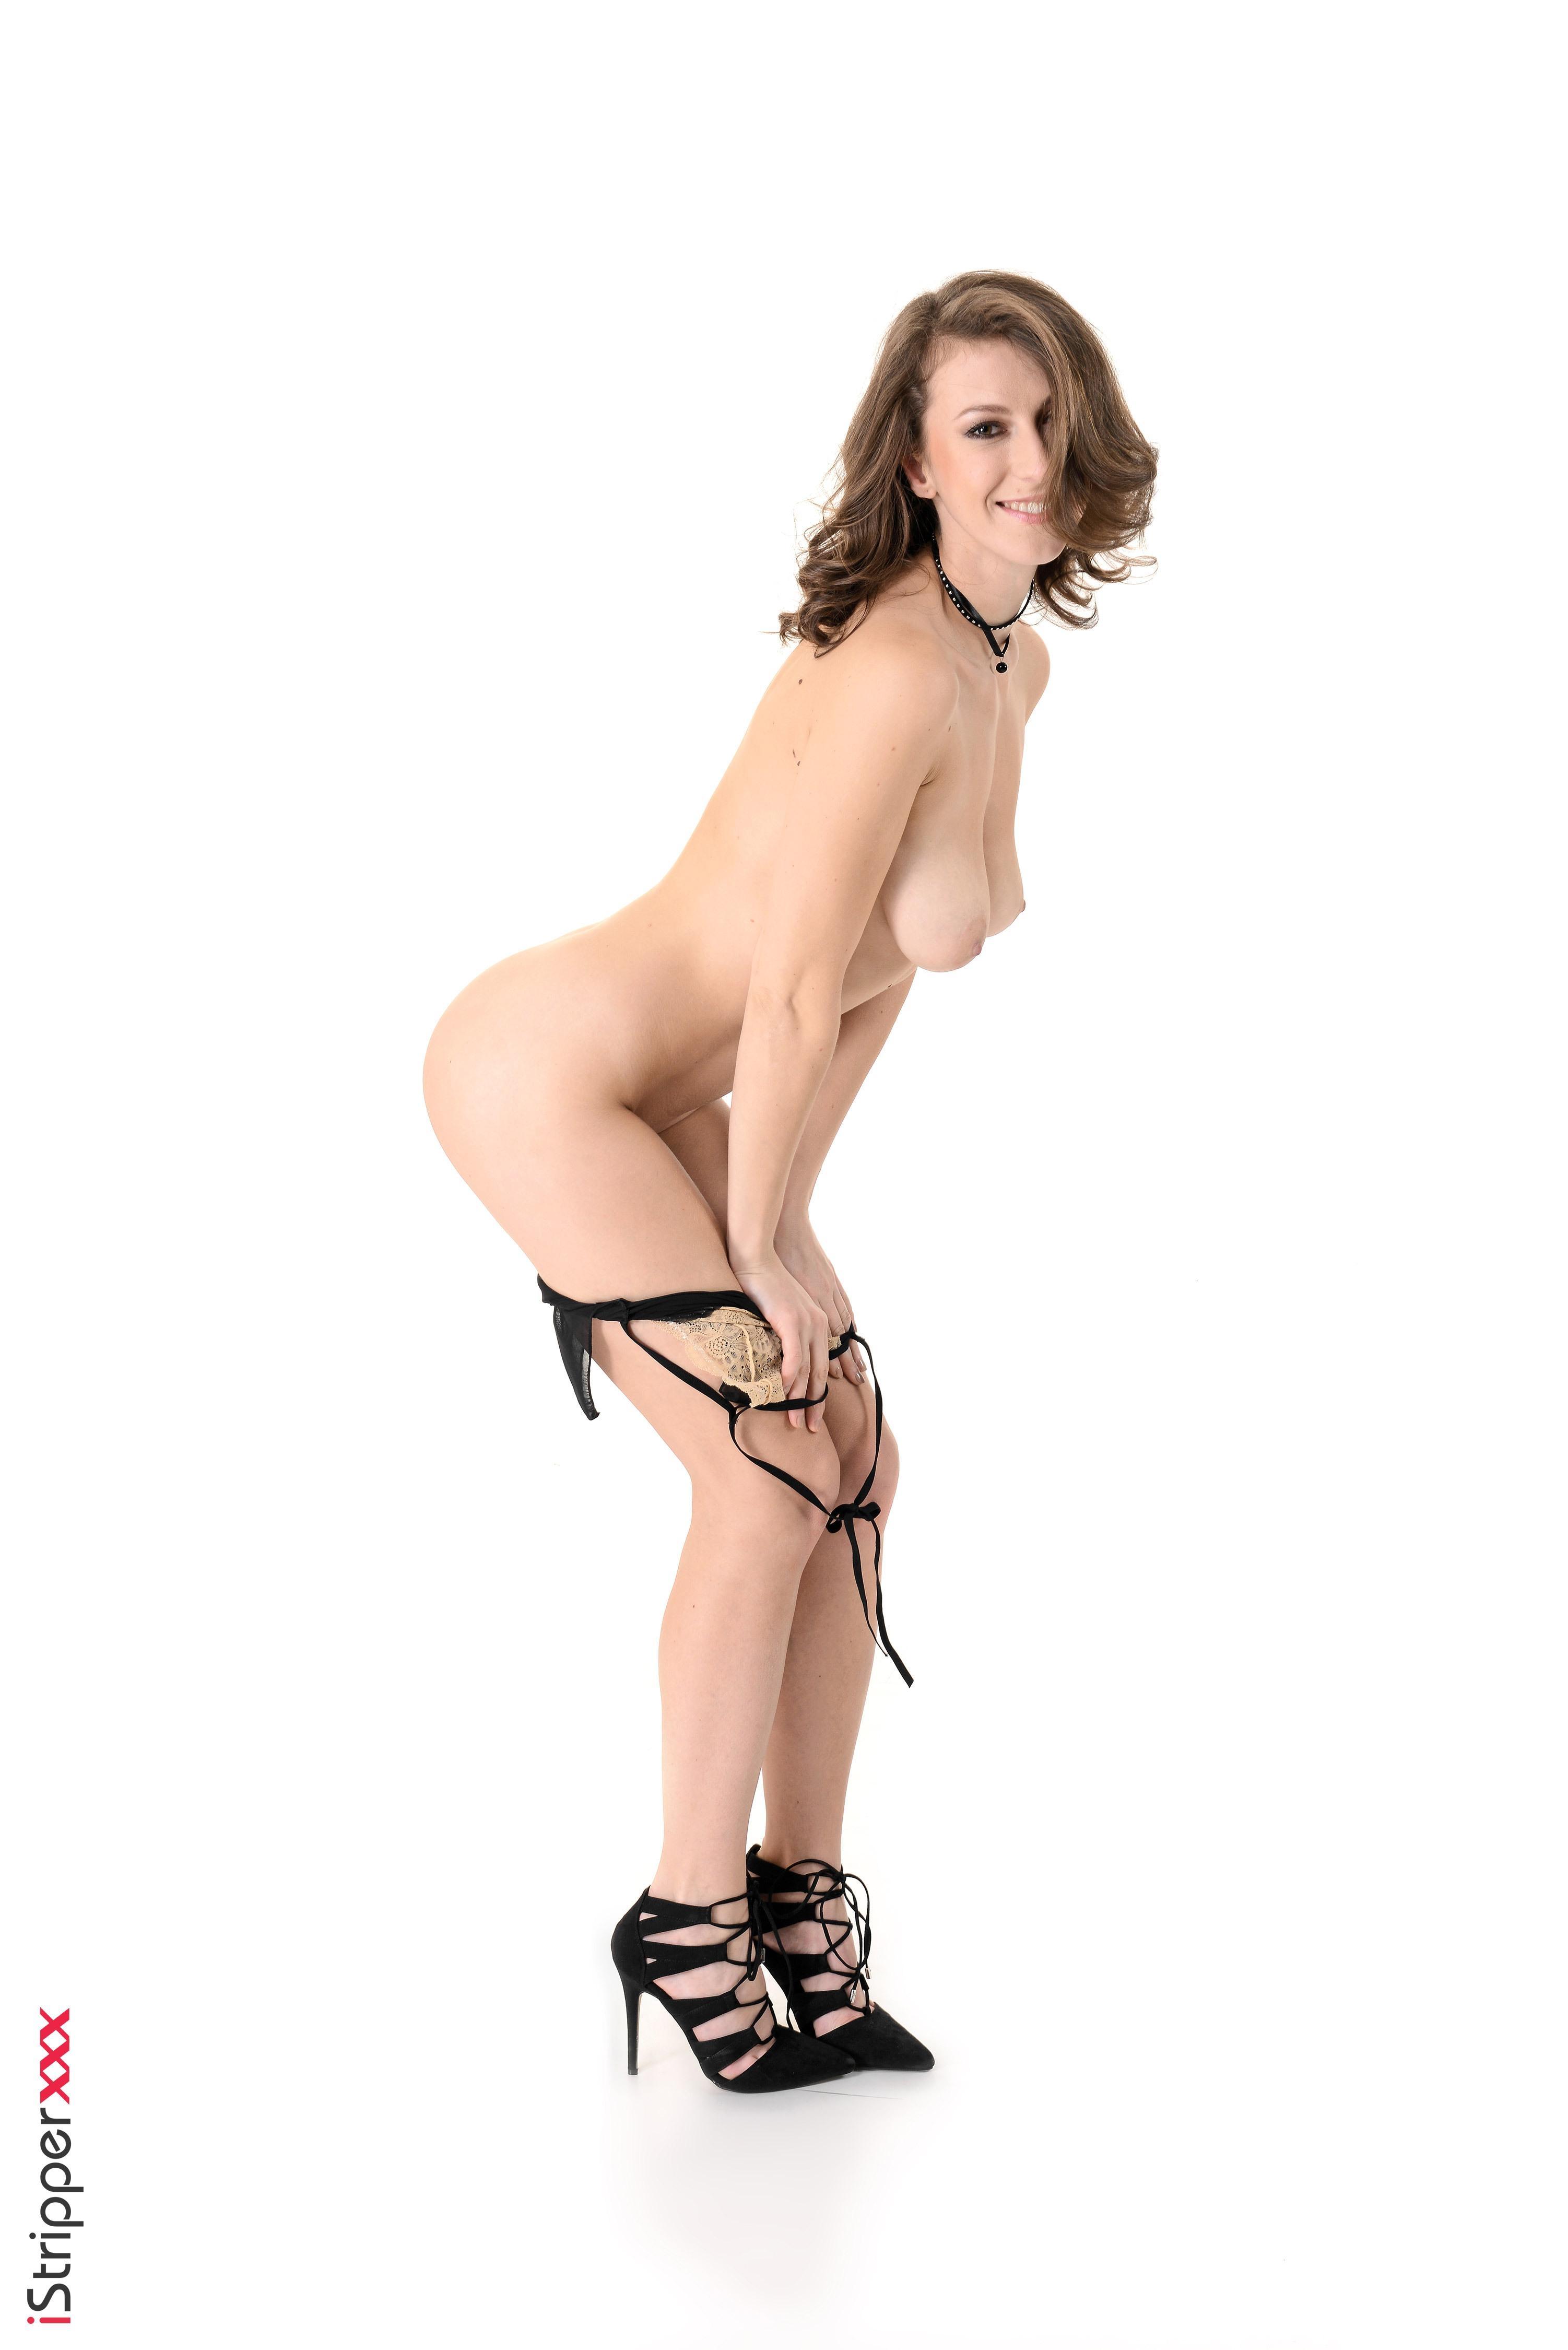 Stunner Emylia Argan dildos her gash after disrobing off magnificent lingerie in high-heeled shoes